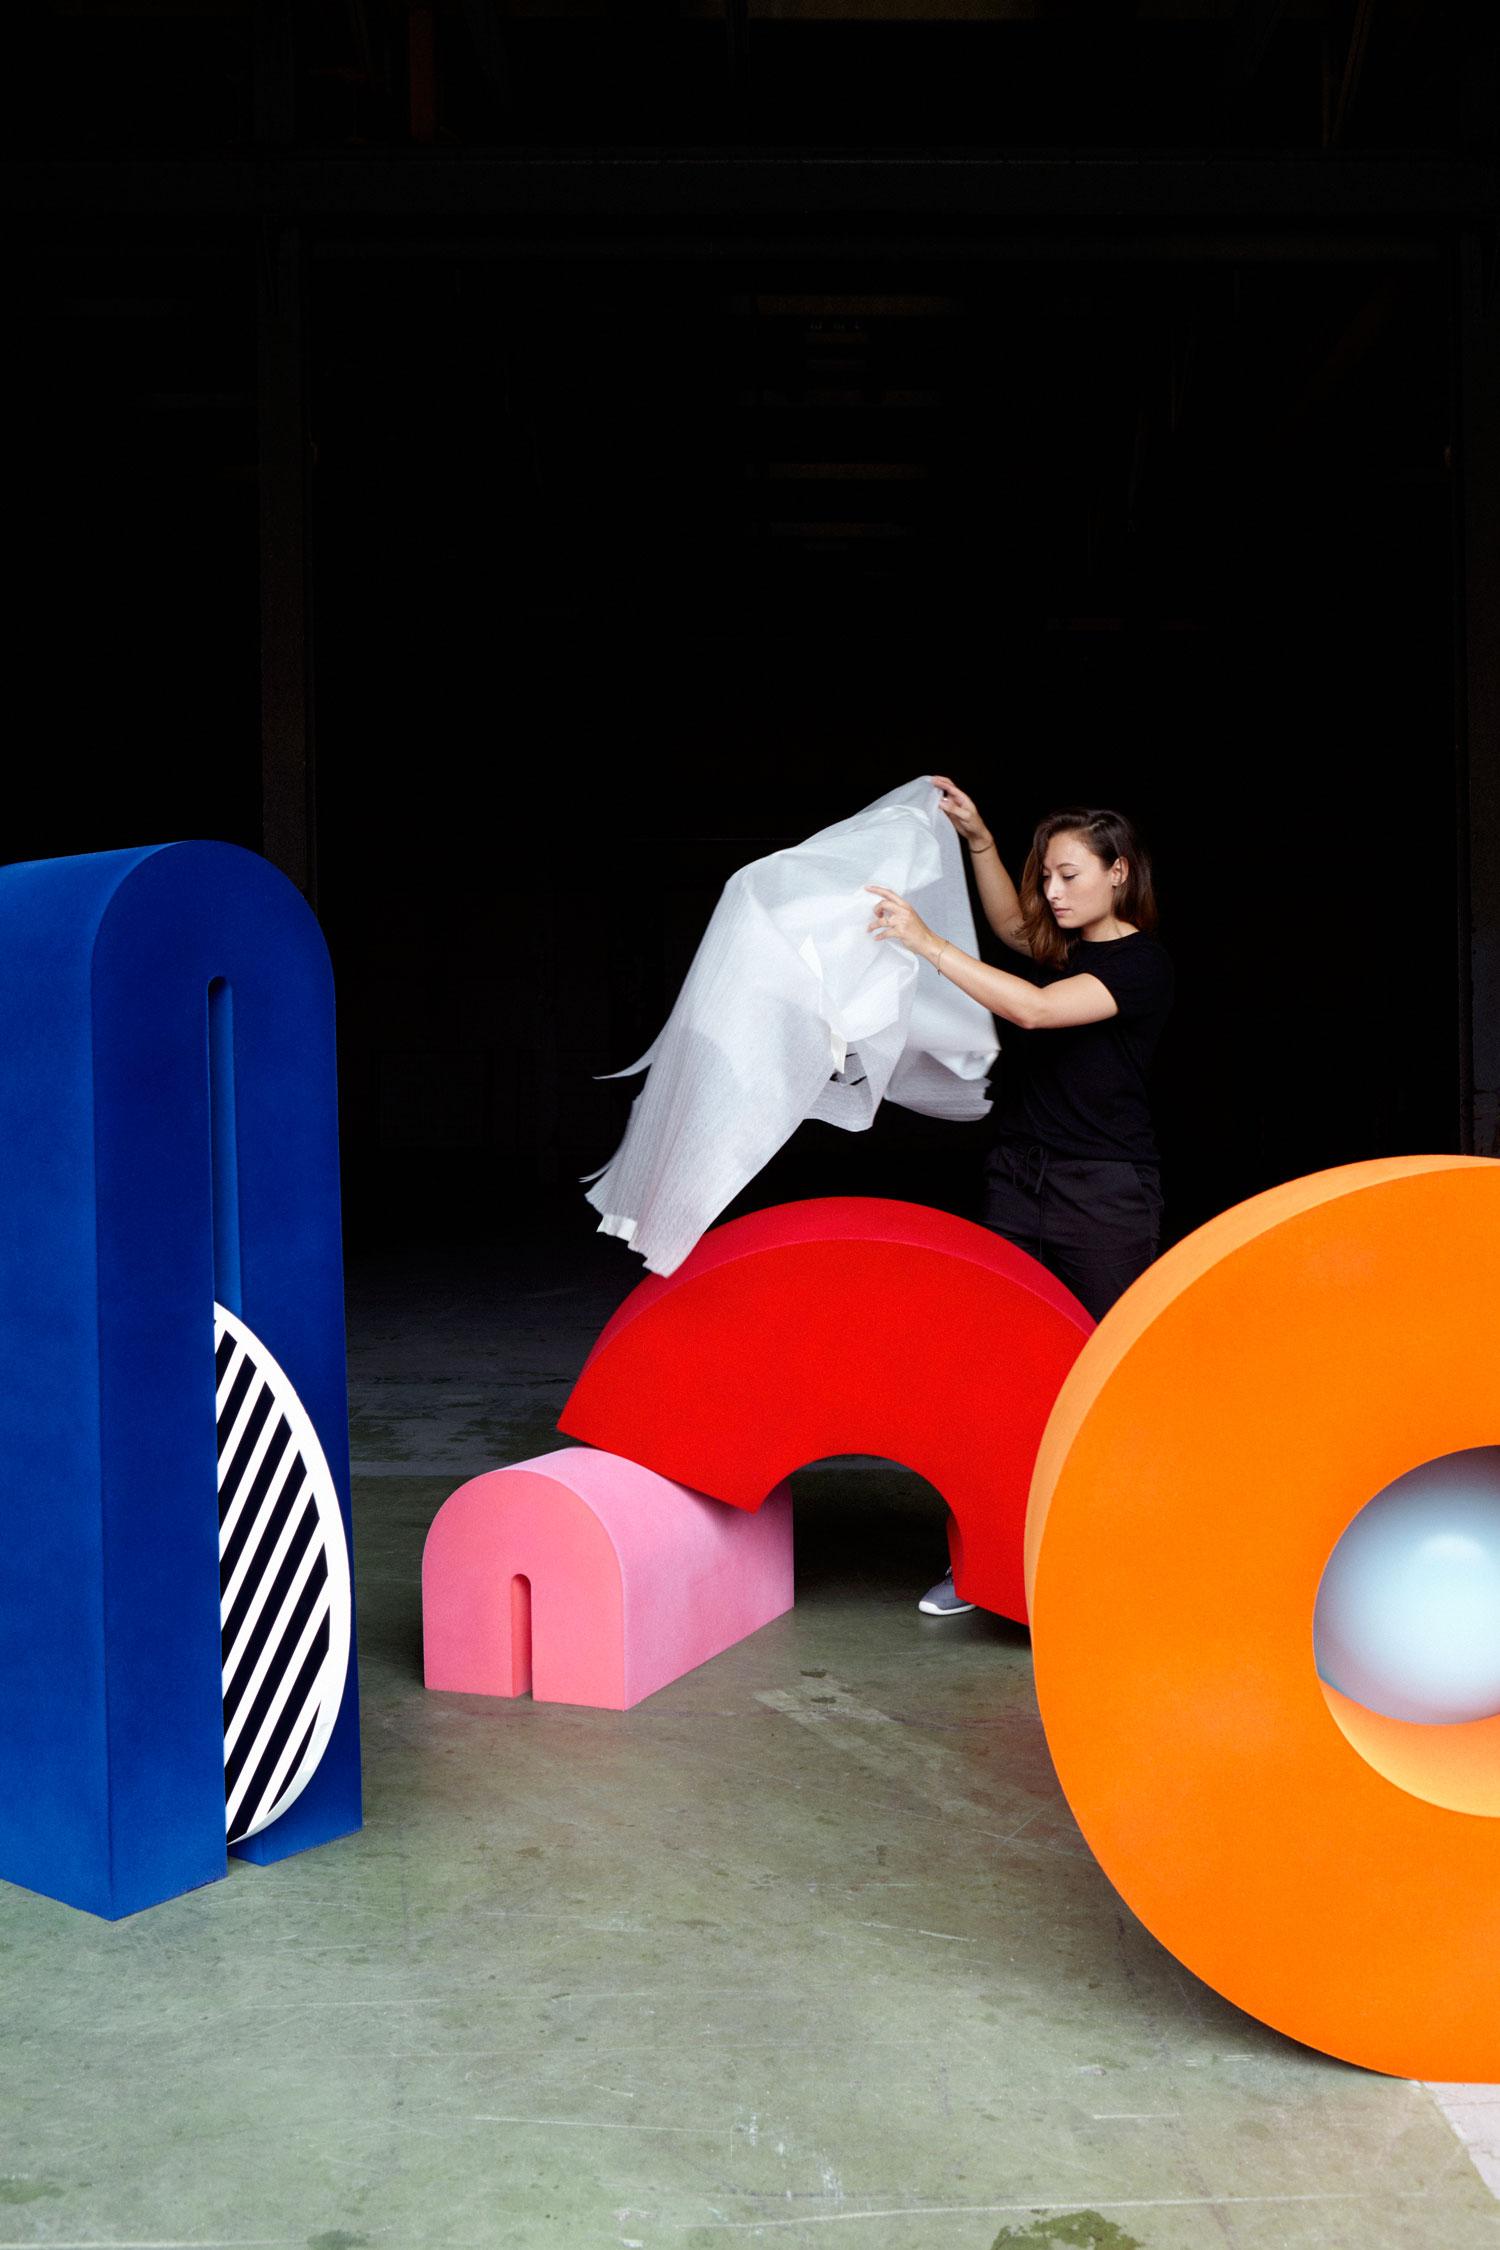 Design Academy Eindhoven 2016 Graduation Show, Mandy van der Heijden | Yellowtrace